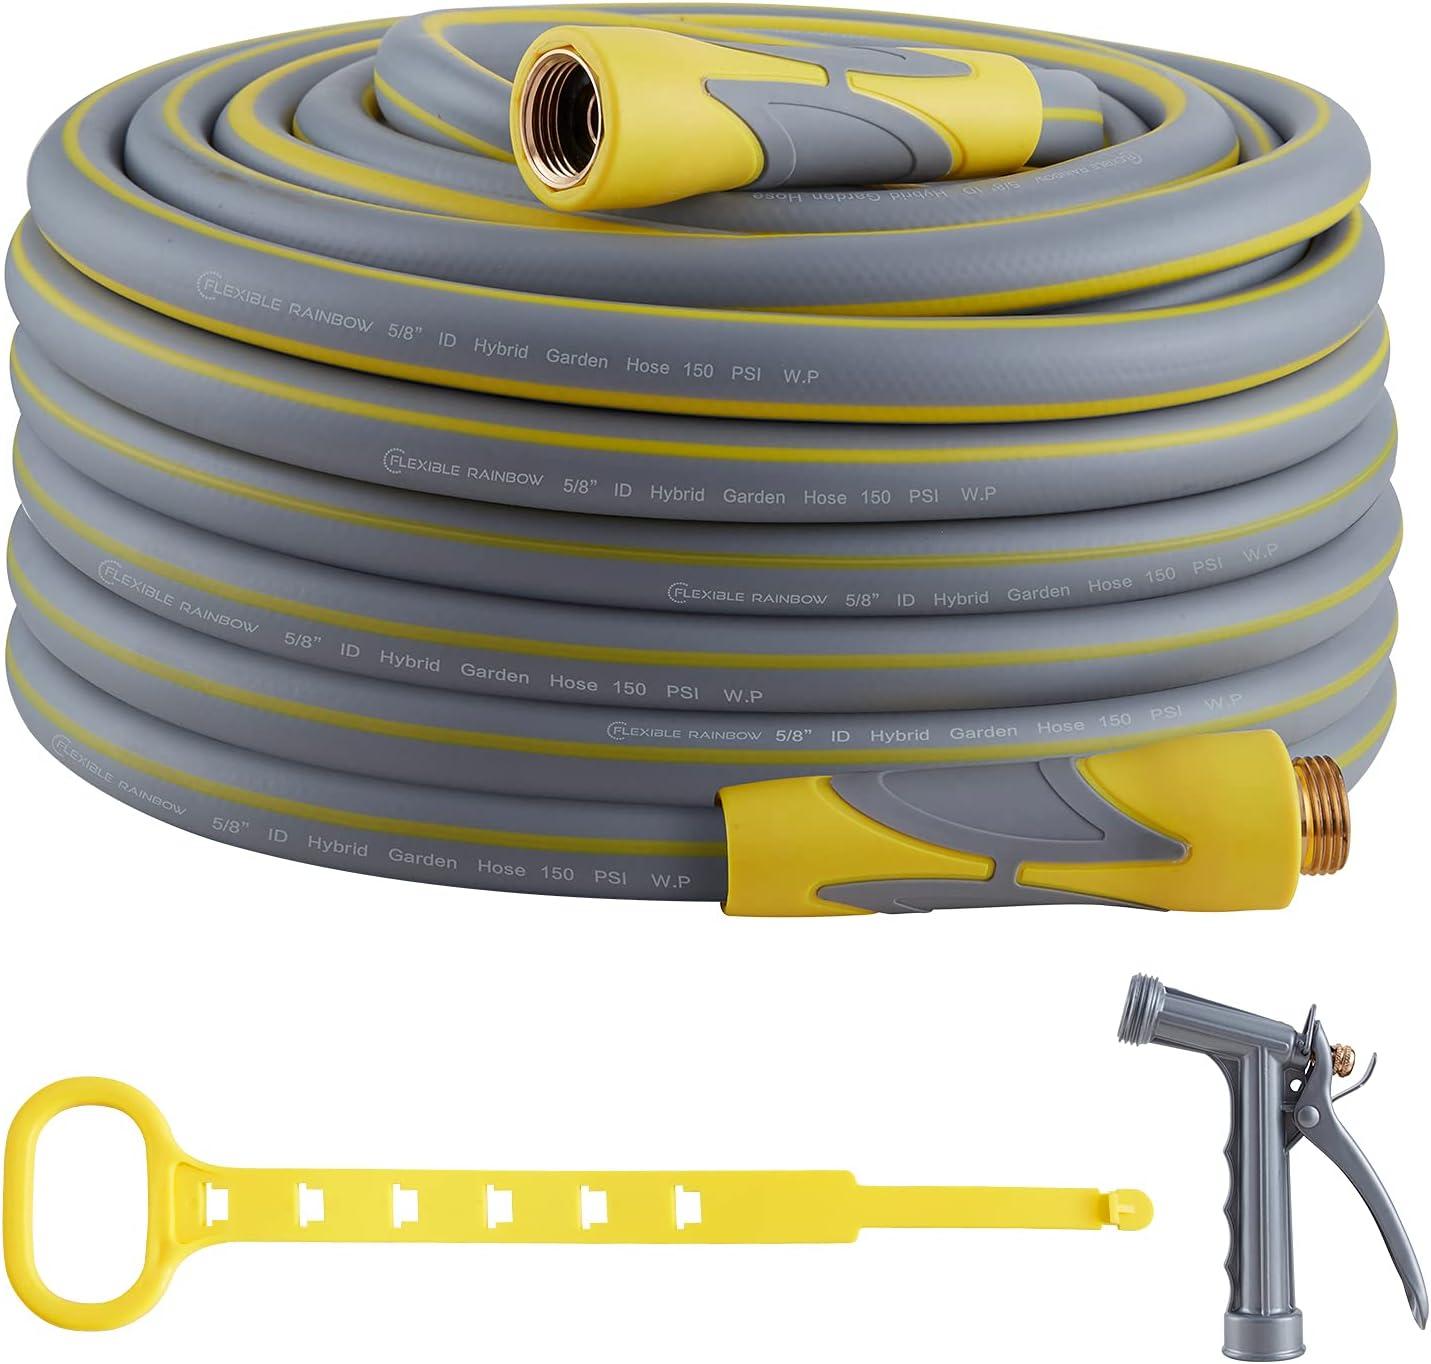 Garden Hose, Hybrid 5/8 in, Heavy Duty, Light Weight and Flexible Water Hose (Yellow, 75' (feet))